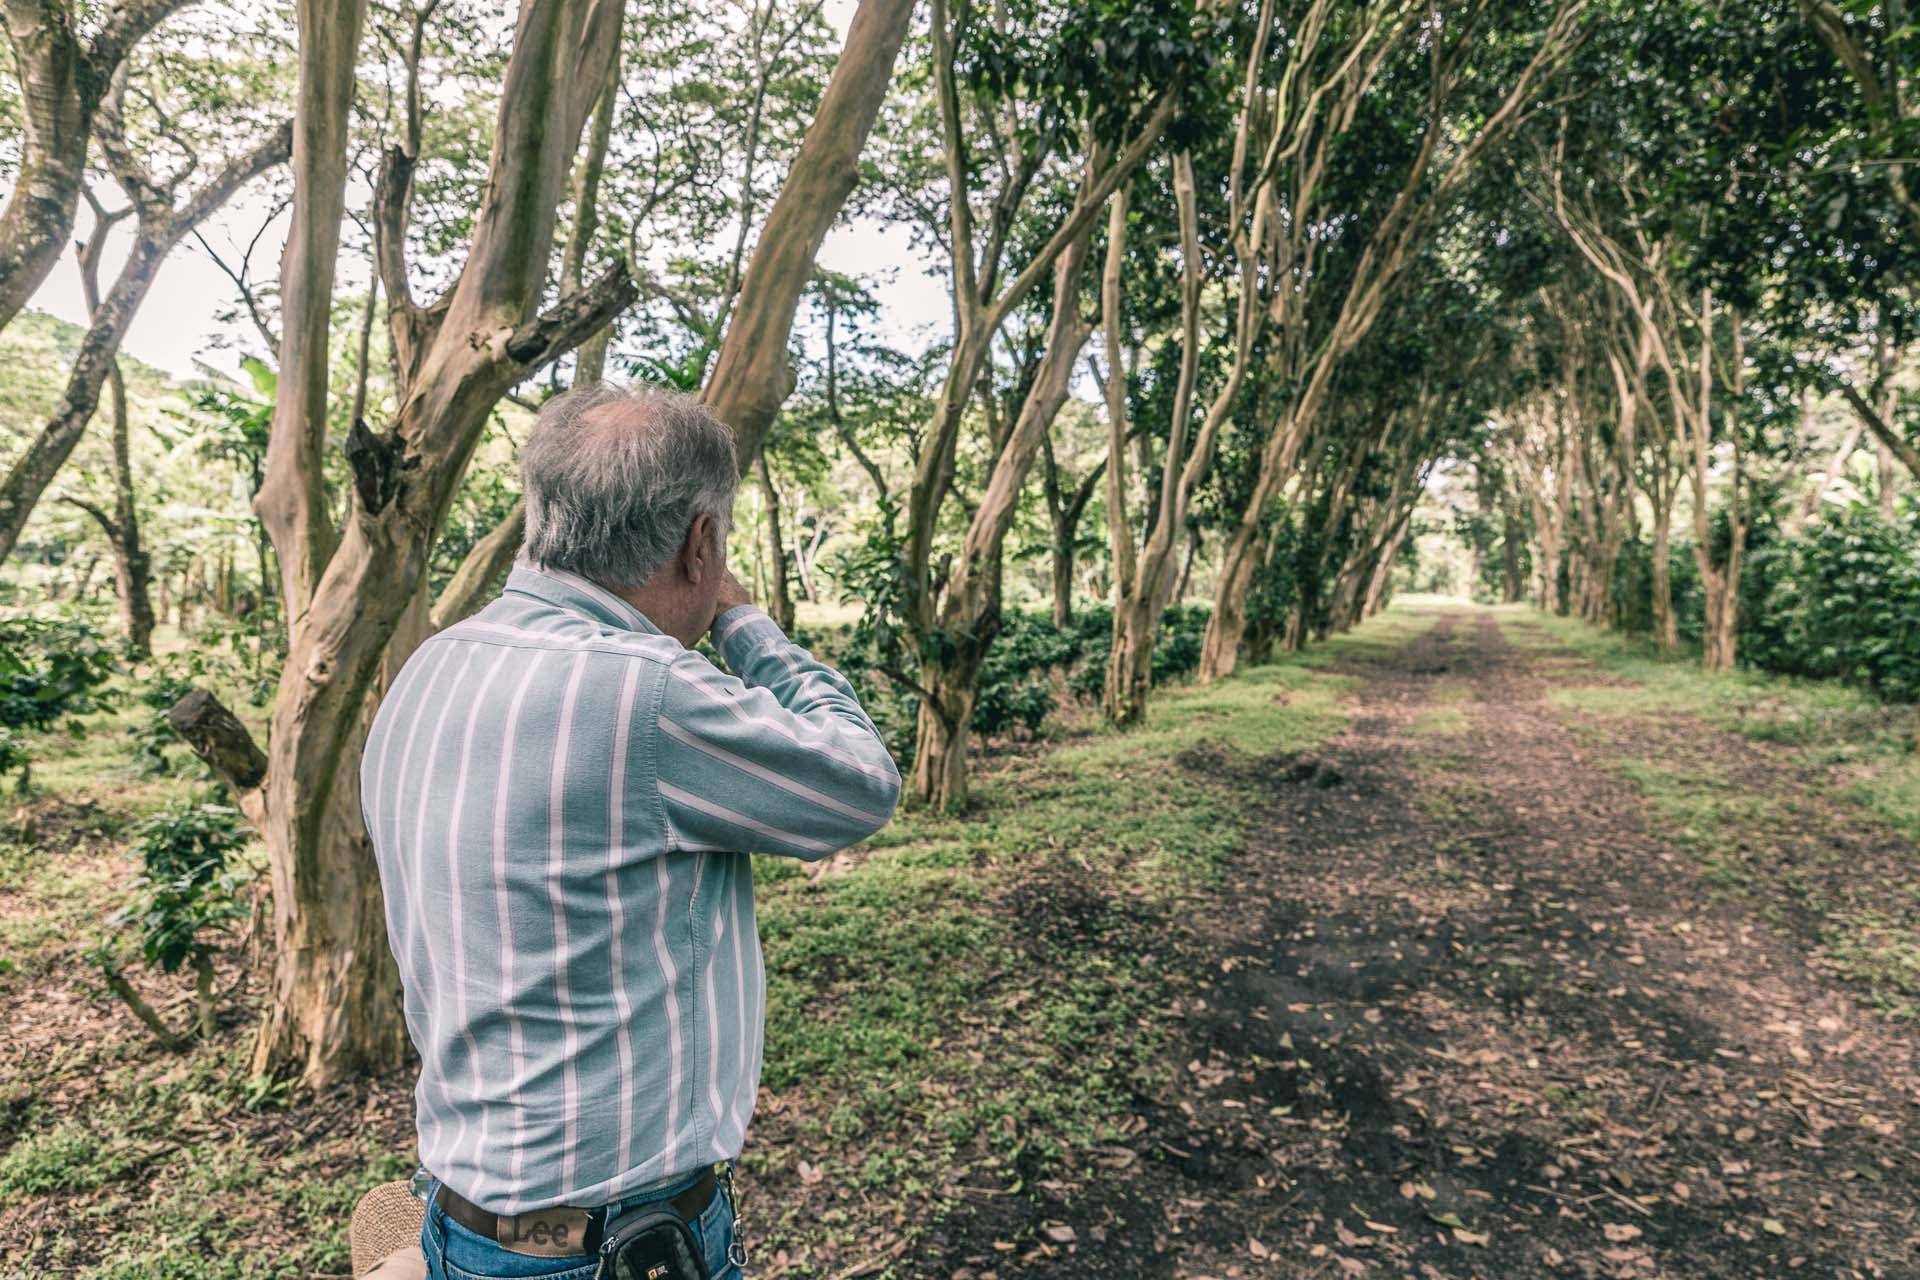 After Atitlan we visited the coffee farm San Jose La Laguna Estate. Here the owner, Roberto, looks down memory lane.